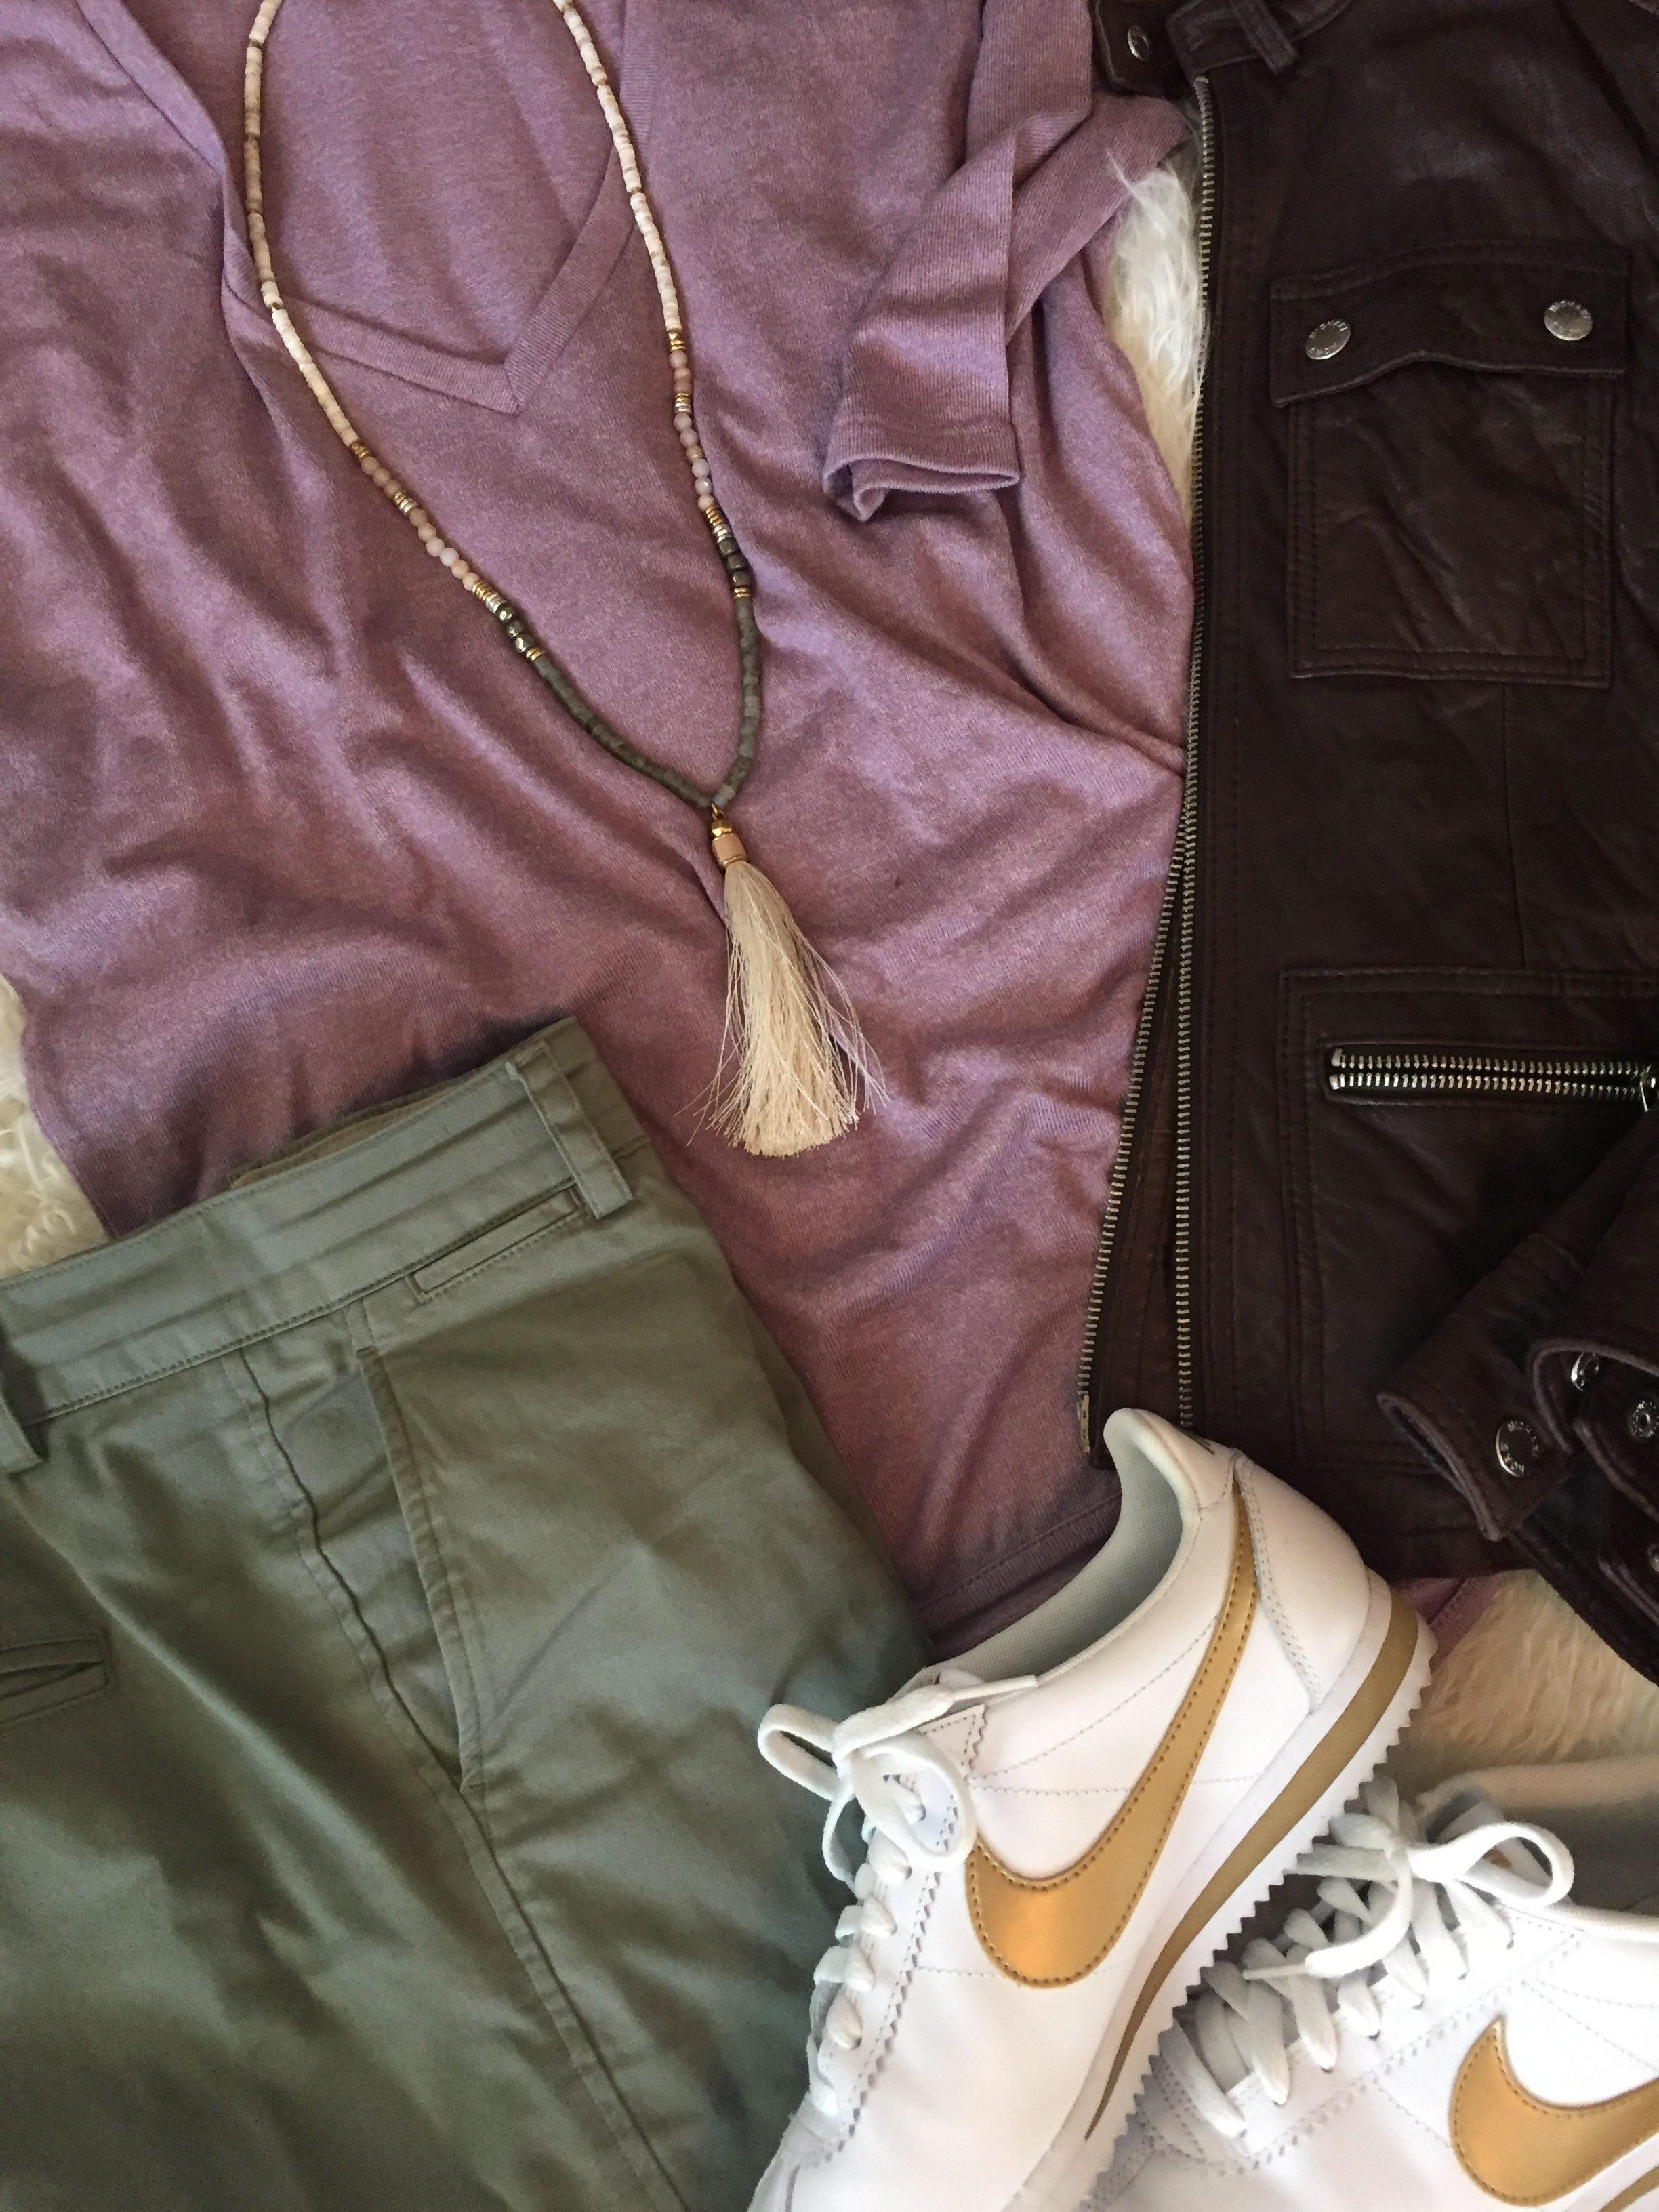 Express, Tshirt, fall fashion, dressy, casual, wear it, all the ways, mauve, camo green, khaki's, leather, nike, everyday style, wardrobe stylist, your stylist